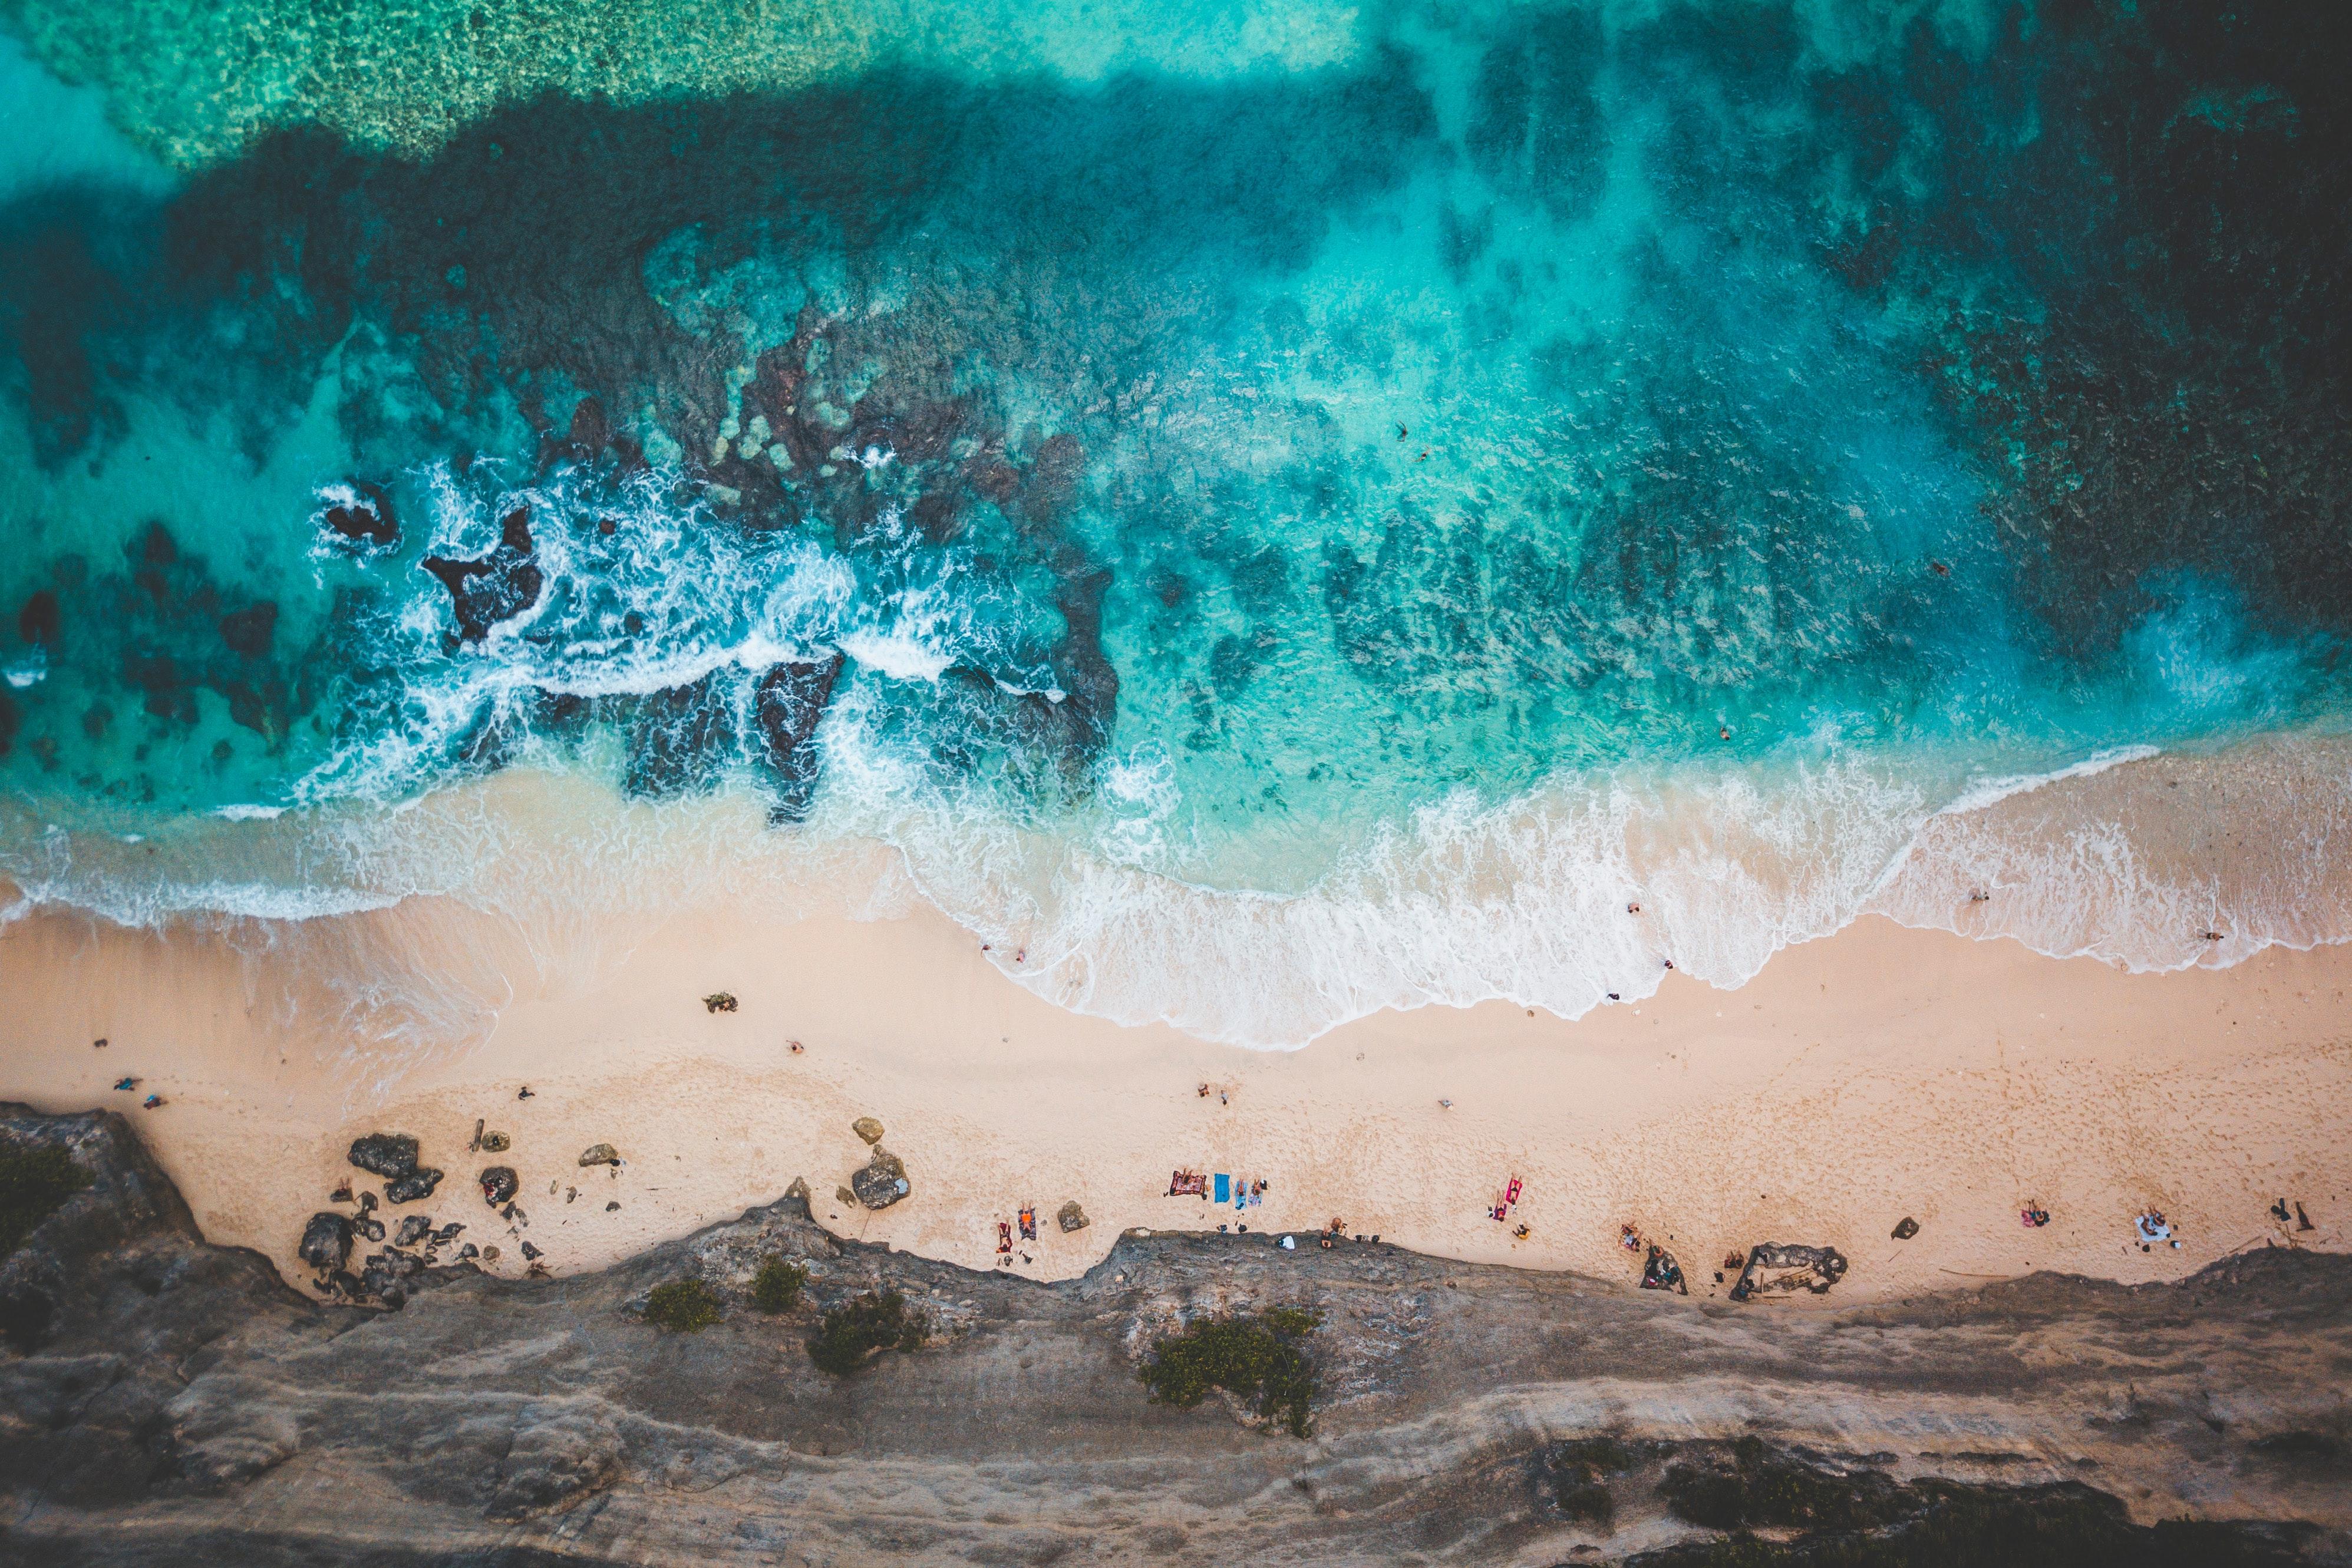 the pic shows beautiful Bali beaches